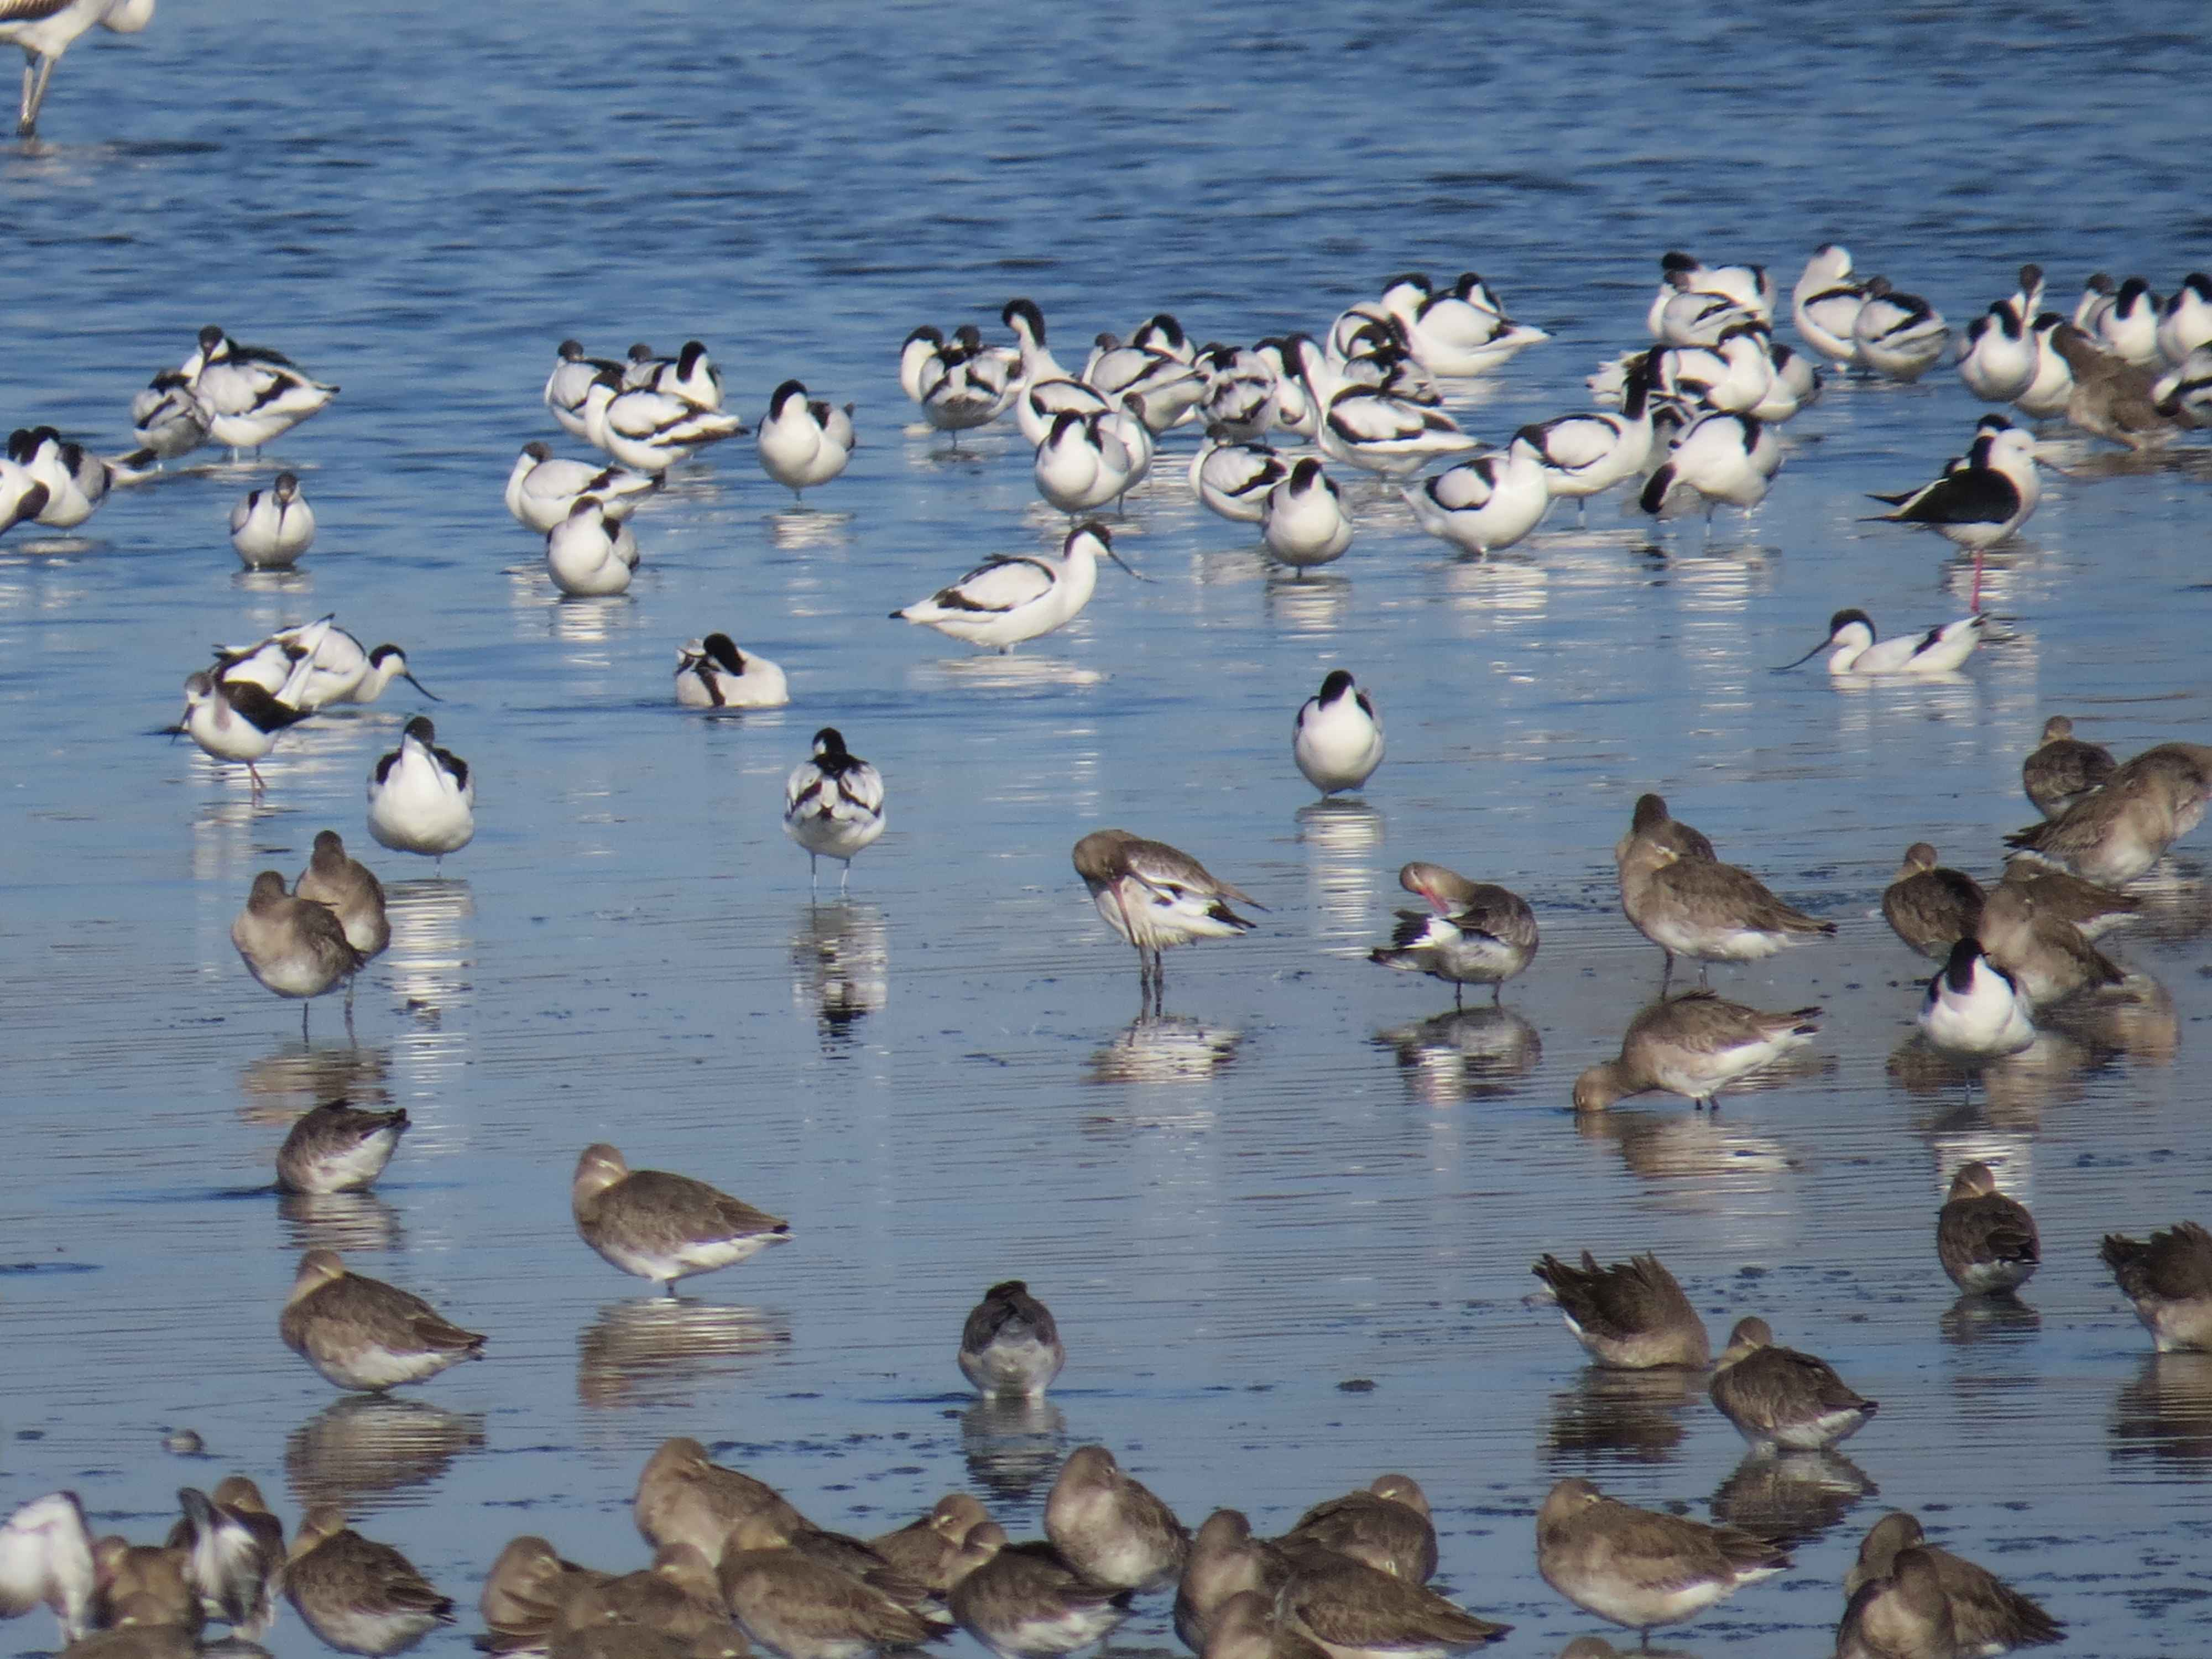 Roosting_shorebirds_Tagus_estuary